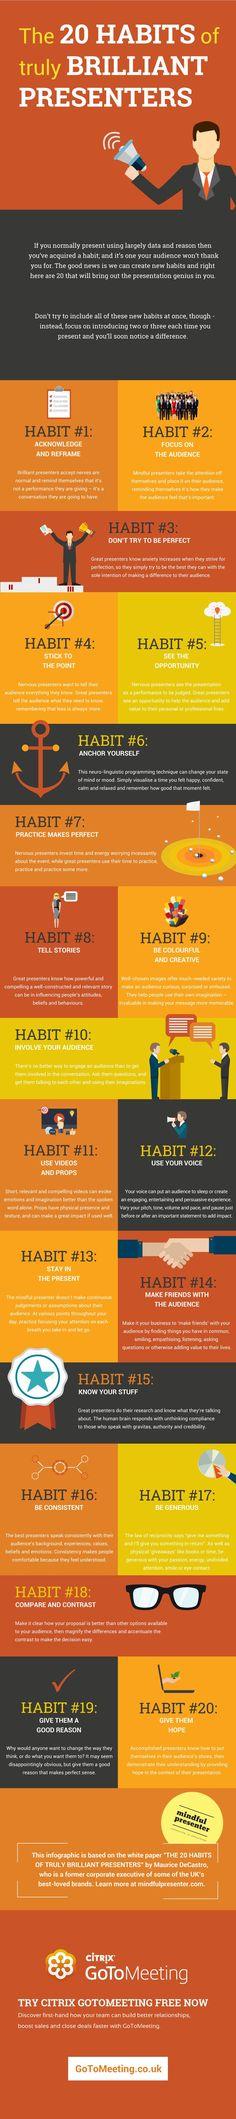 20 Habits οf Truly Brilliant Presenters Infographic - http://elearninginfographics.com/20-habits-%ce%bff-truly-brilliant-presenters-infographic/